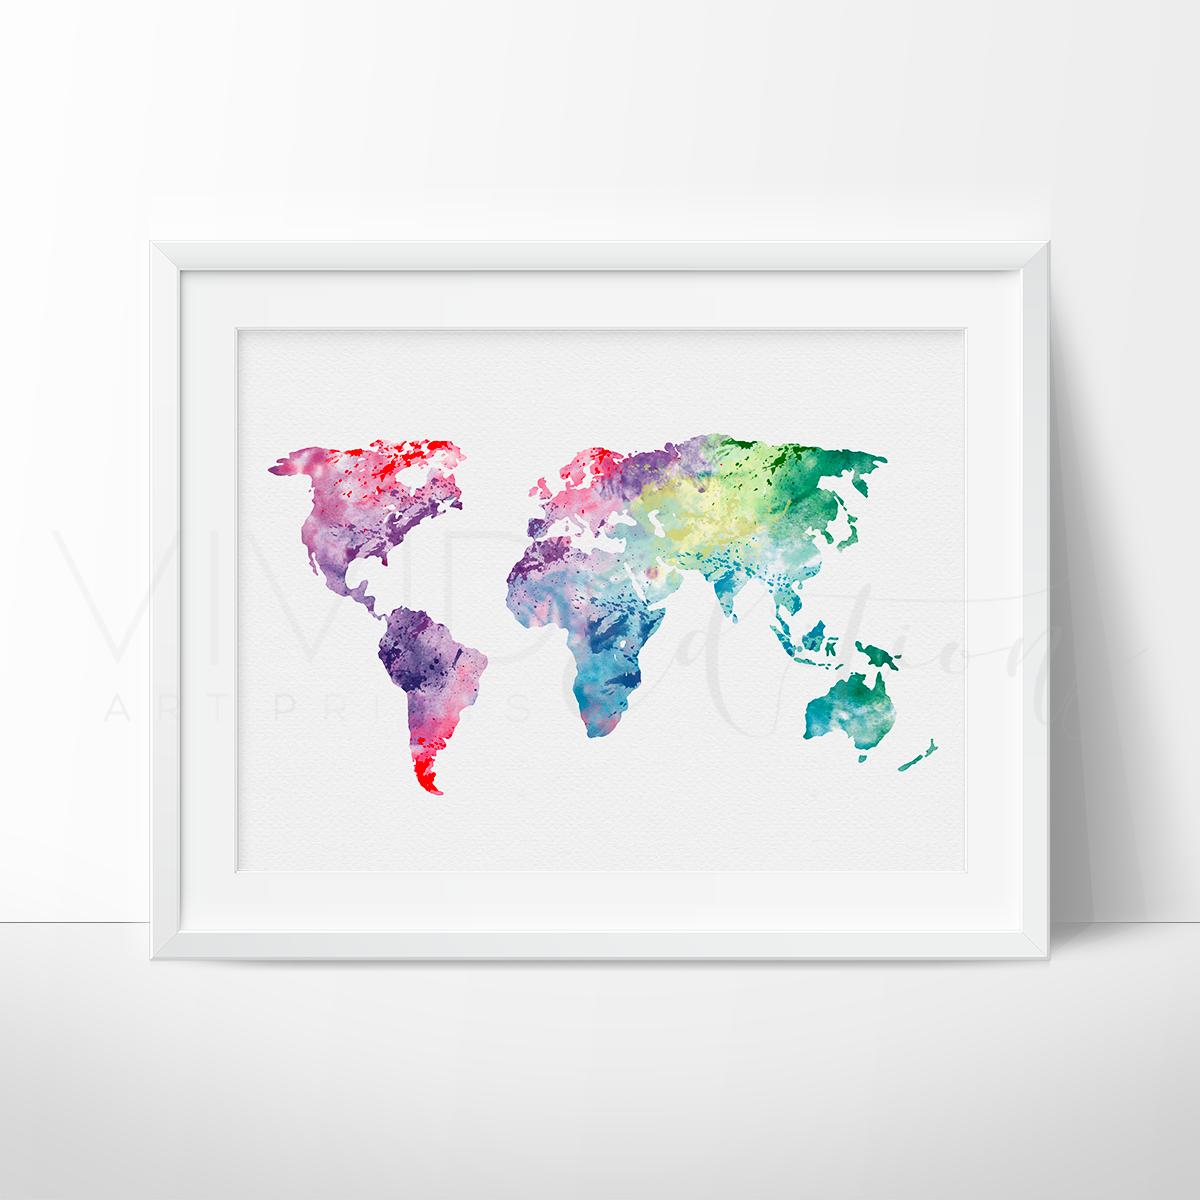 World map 1 watercolor art print watercolor arts pinterest world map canvas watercolor art print wall art by la printerie gumiabroncs Choice Image